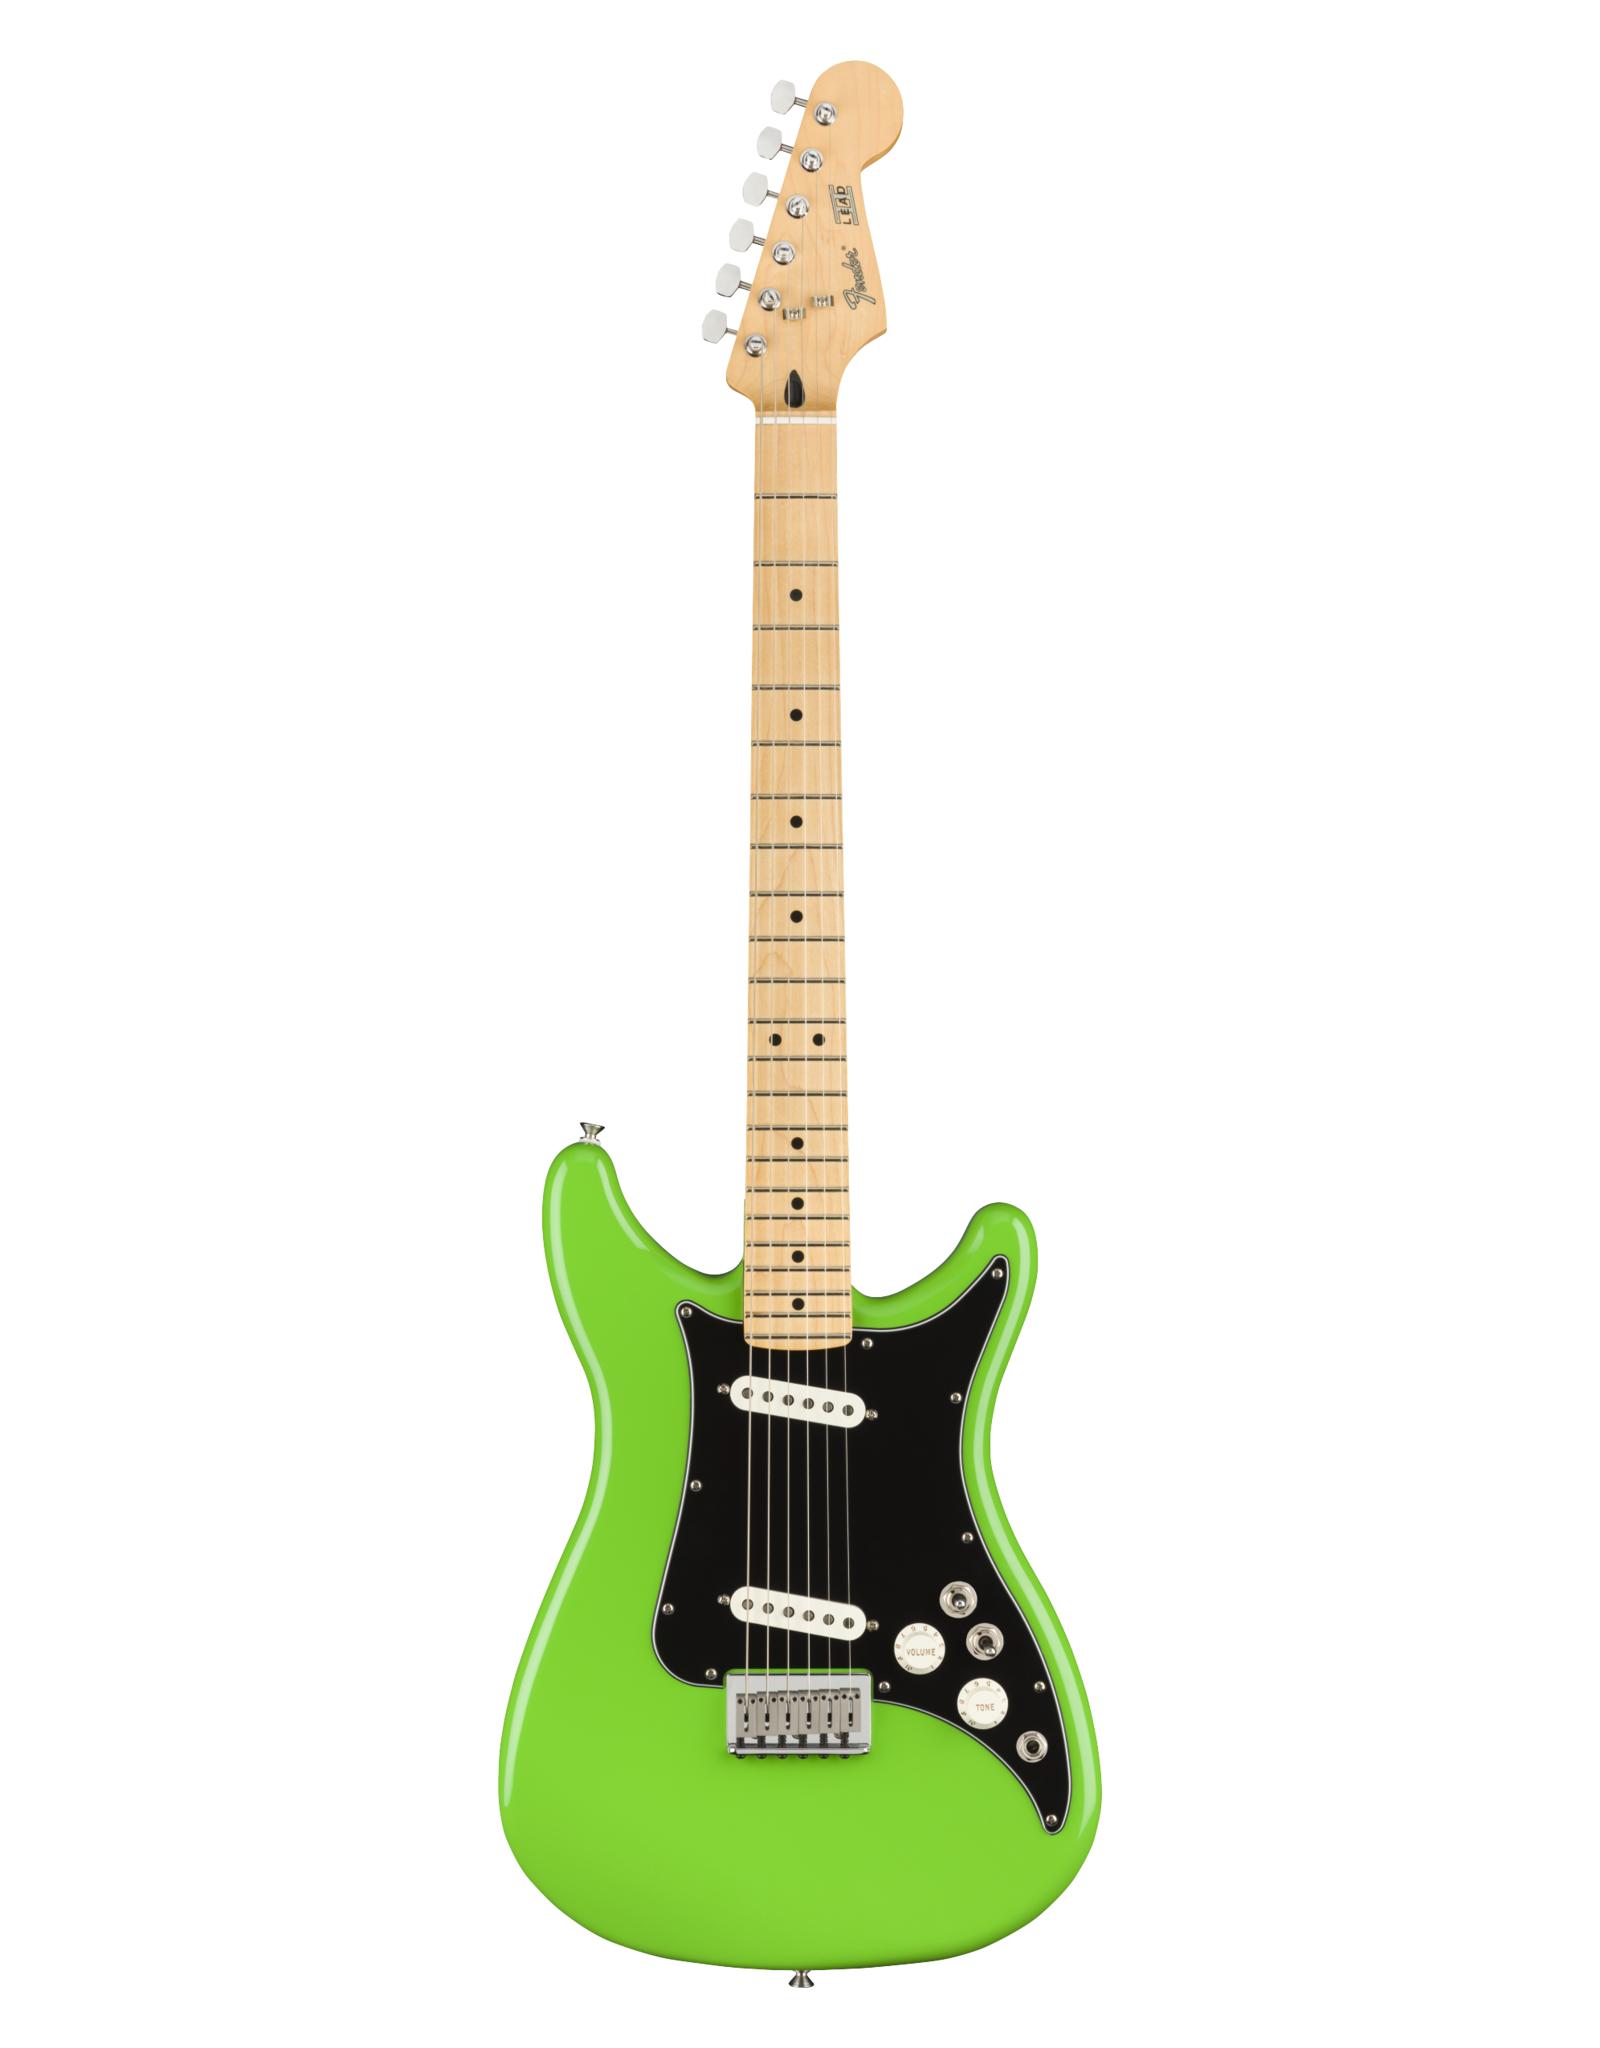 Fender Fender Player Series Lead II, Neon Green, Maple Fingerboard